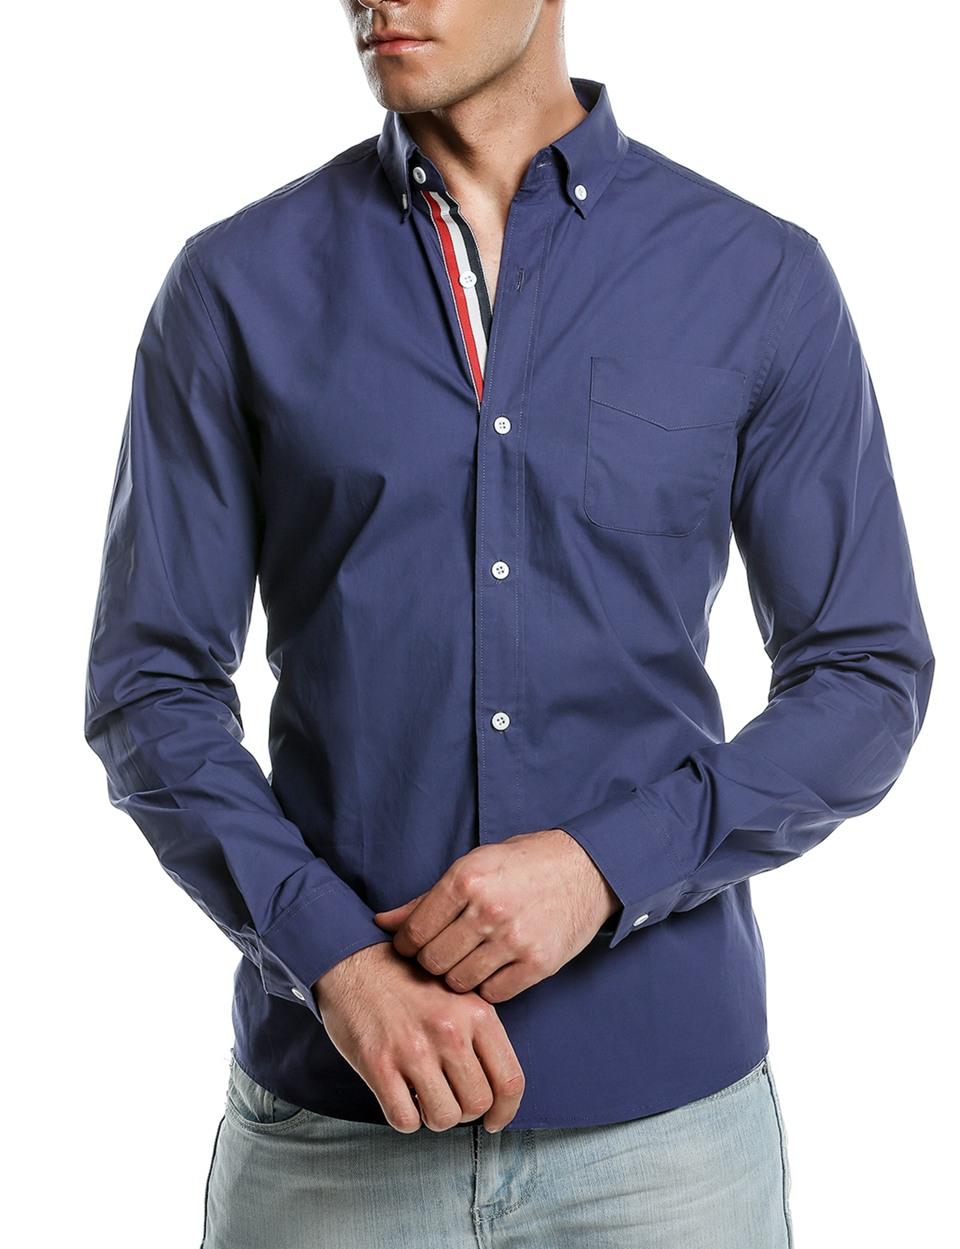 shirt (11)